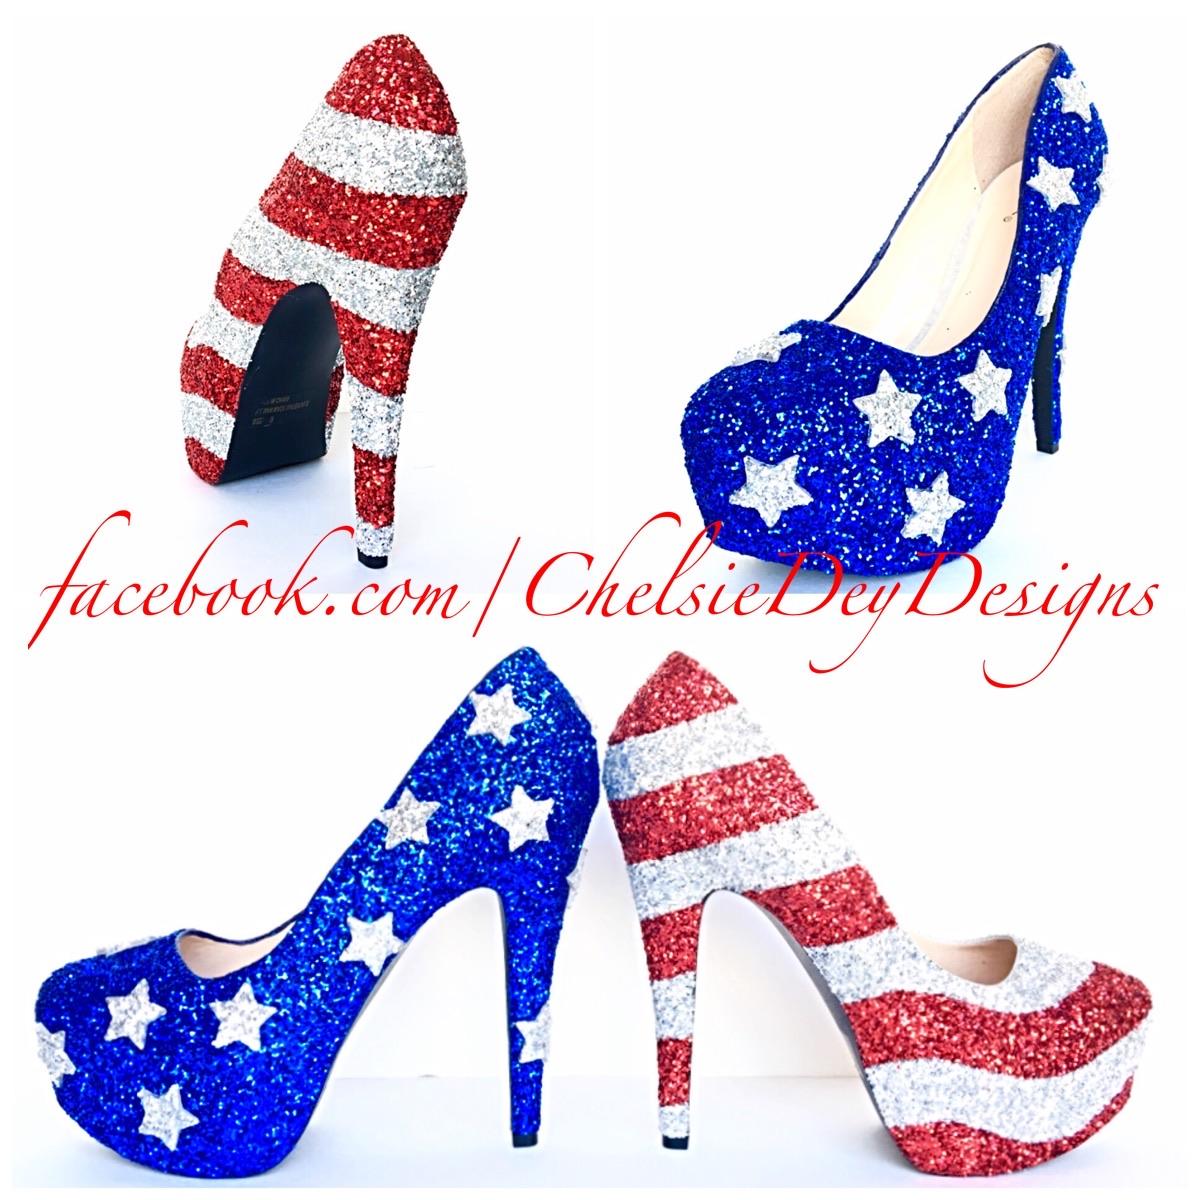 4bc788e6a Ready to Ship Womens Sparkly Black Red White Glitter High Heels Harley  Quinn Superhero Shoes wedding … American Flag Glitter High Heels, Red White  Blue ...